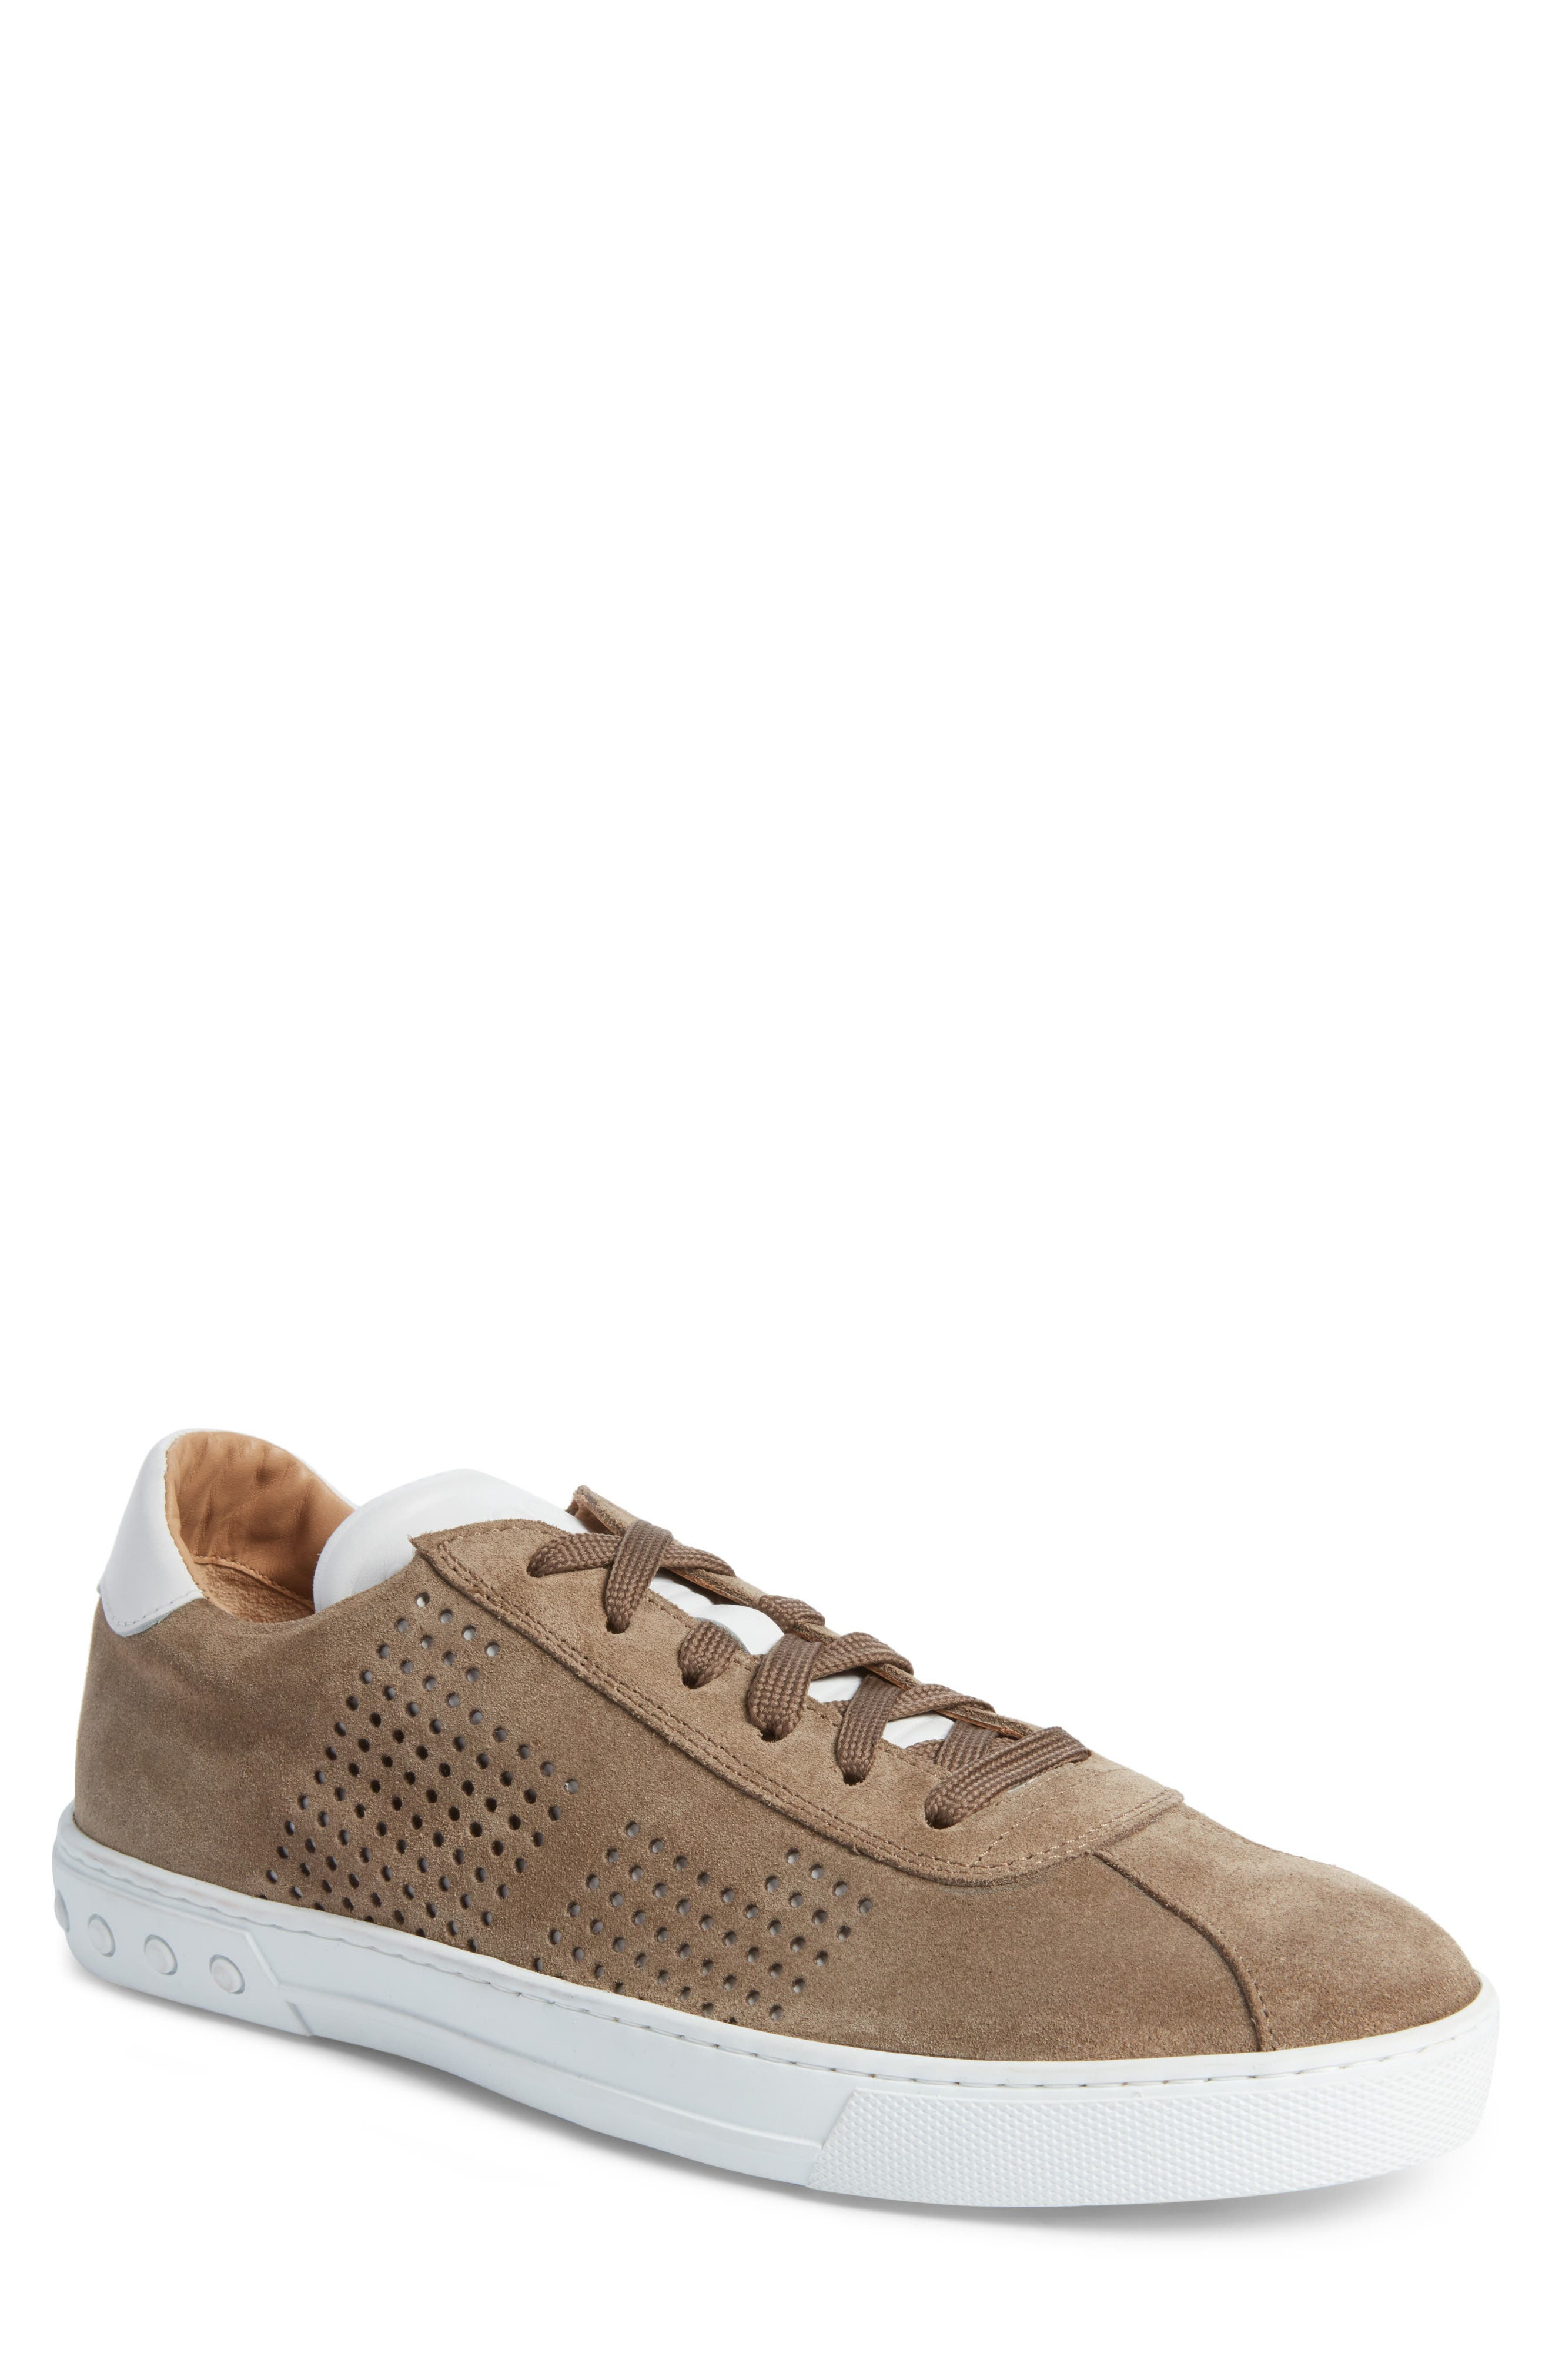 Cassetta Sneaker,                             Main thumbnail 1, color,                             237